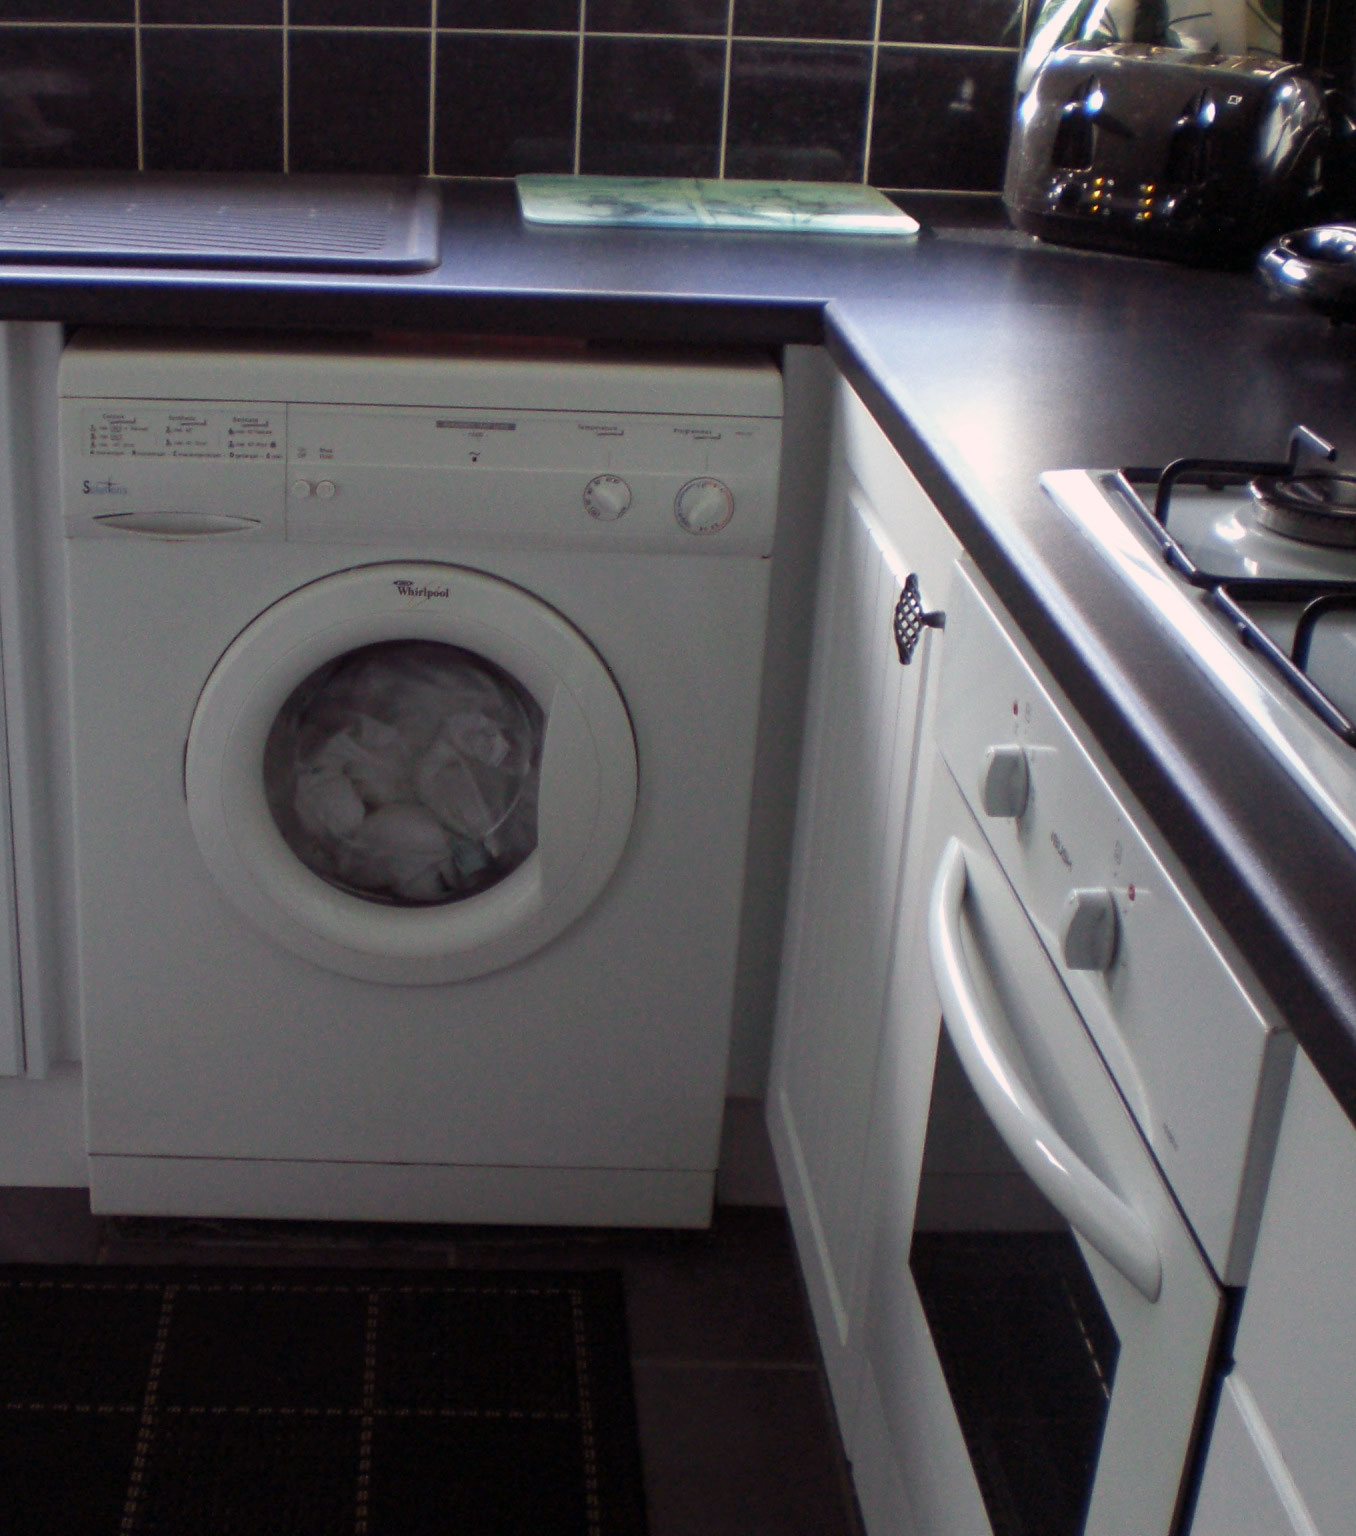 jesus washed me in the washing machine